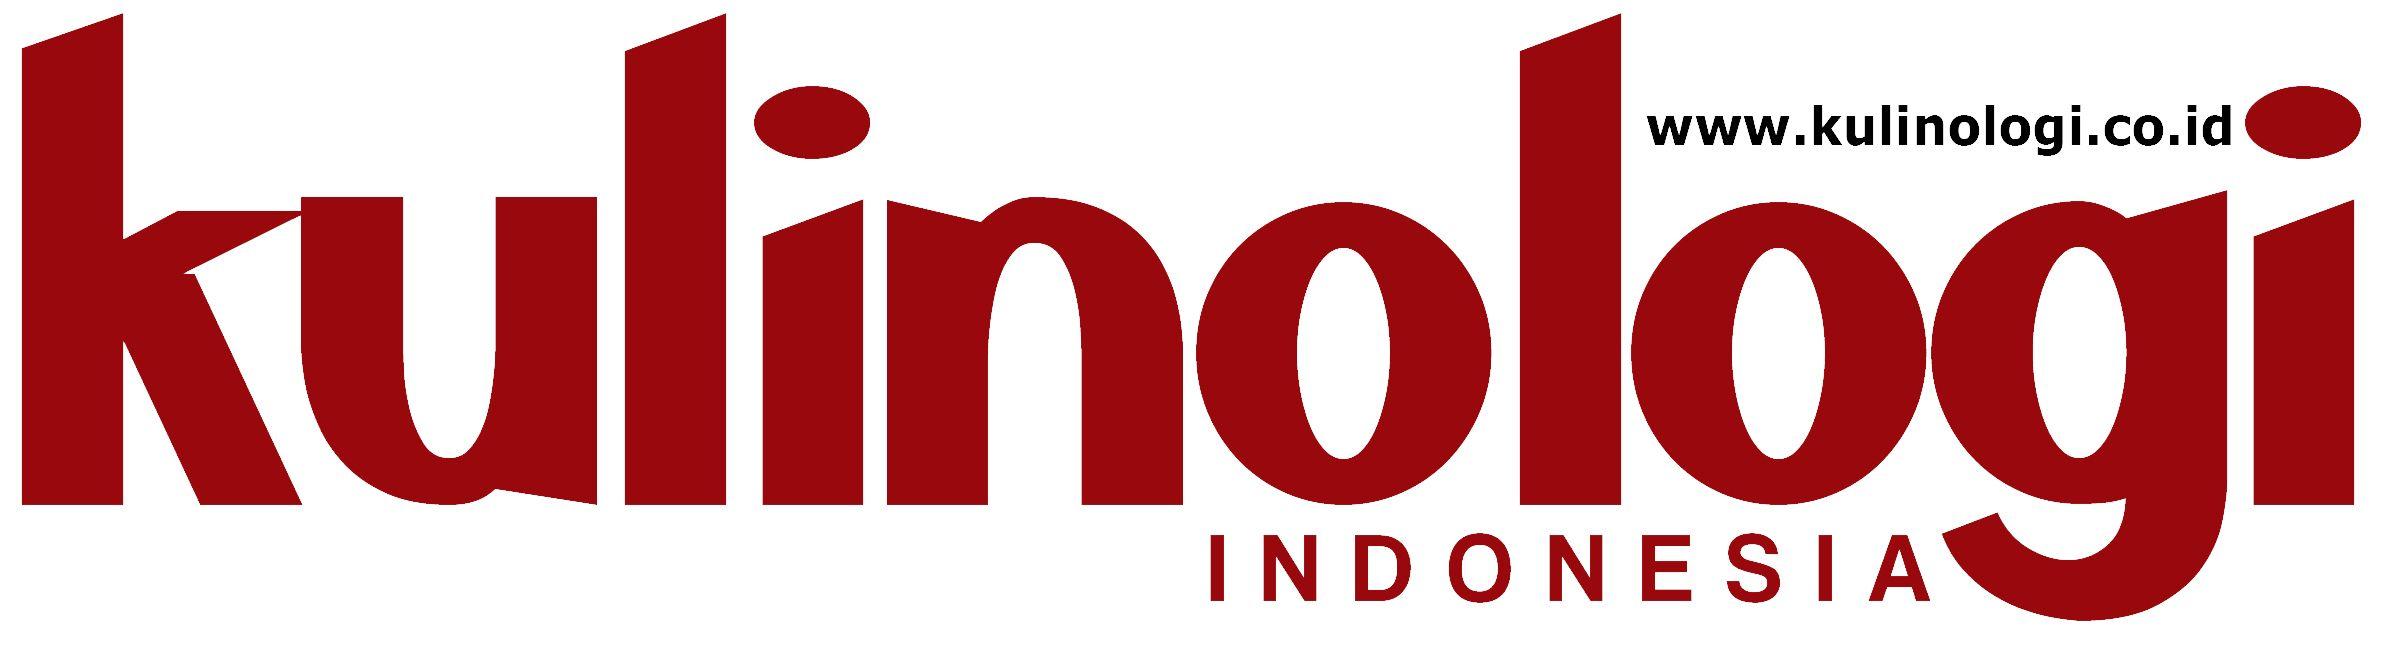 logo KULINOLOGI